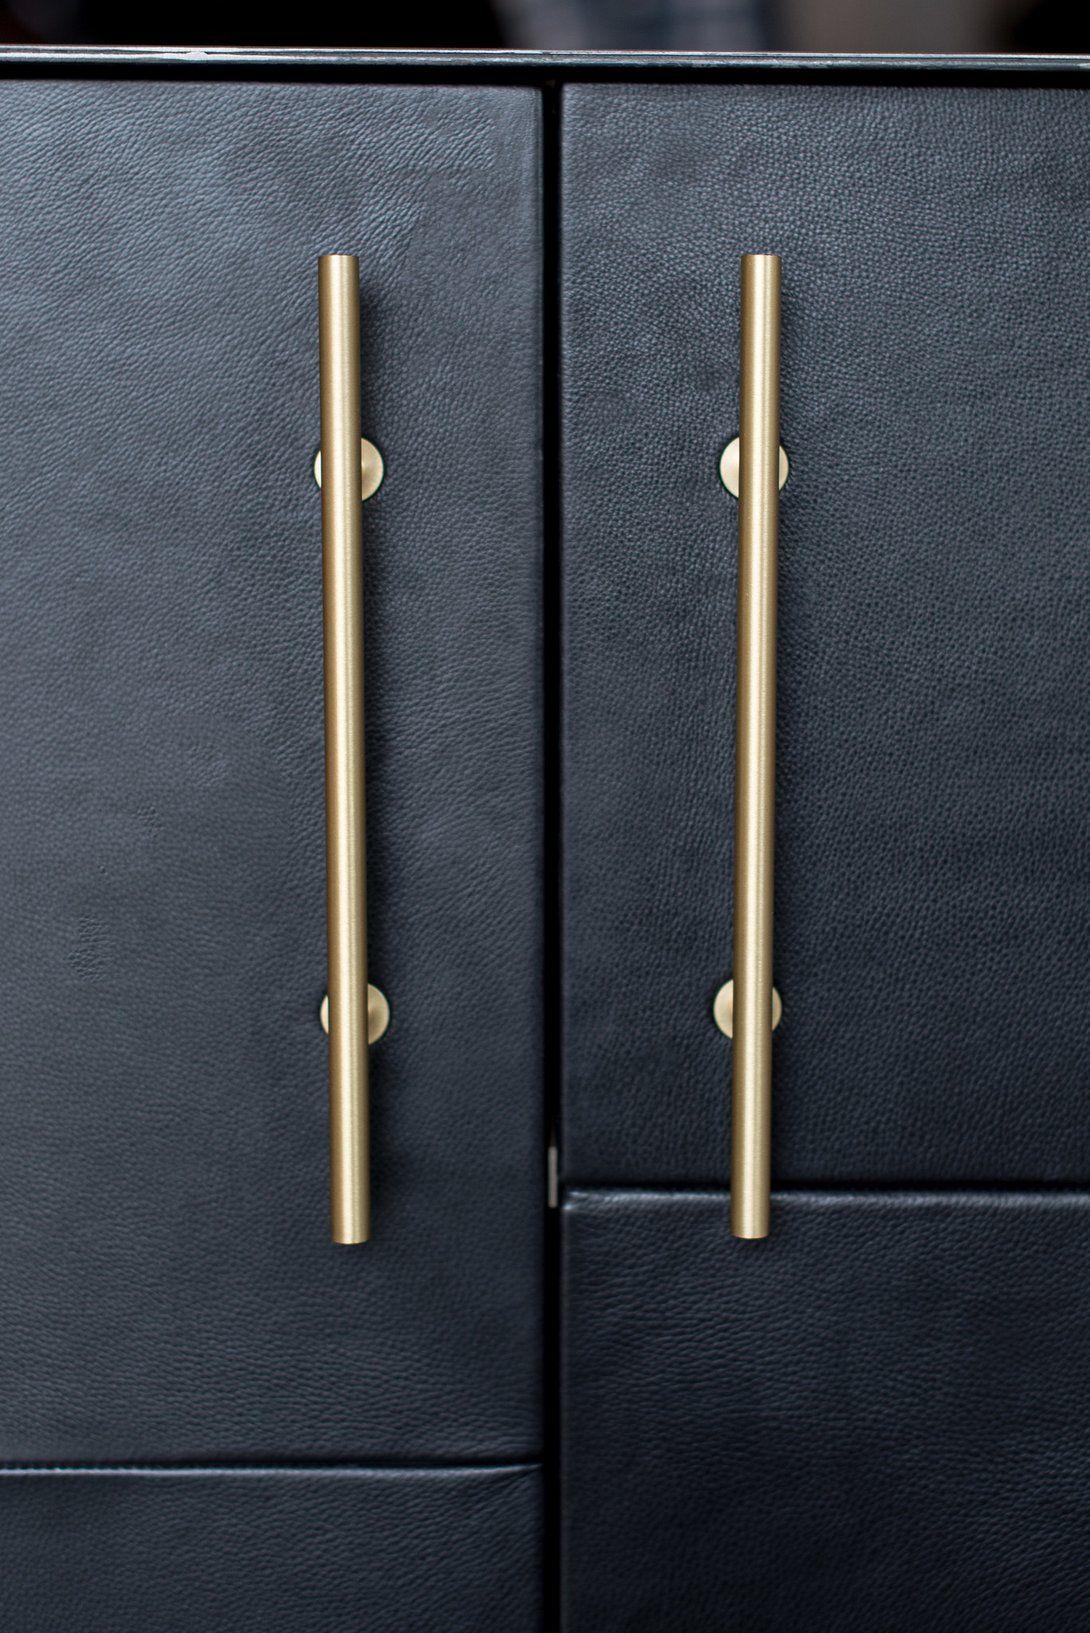 Bronson Credenza Blk Home Office Setup Brass Handles Steel